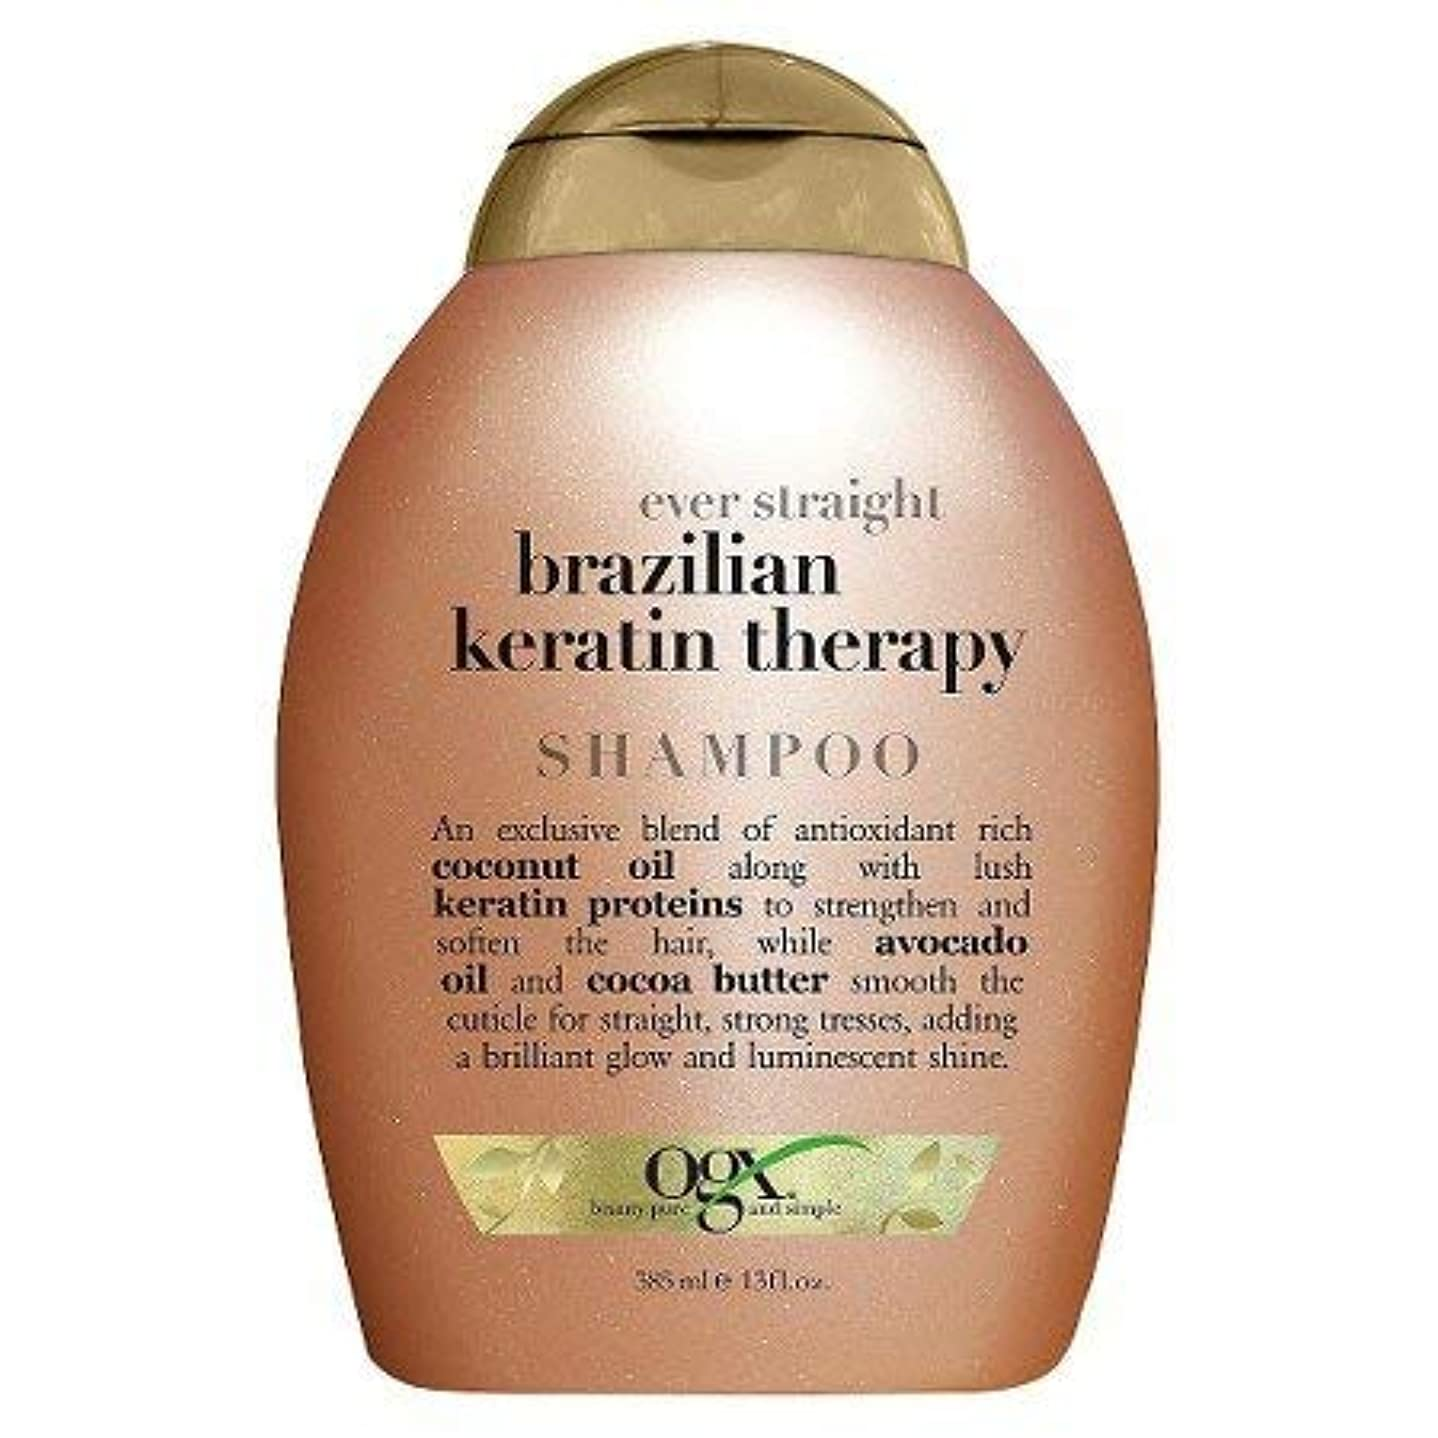 OGX Ever Straight Sulfate & Sodium Free Brazilian Keratin Therapy Shampoo 360ml エヴァーストレートブラジルケラチンセラピーシャンプーシャンプー...